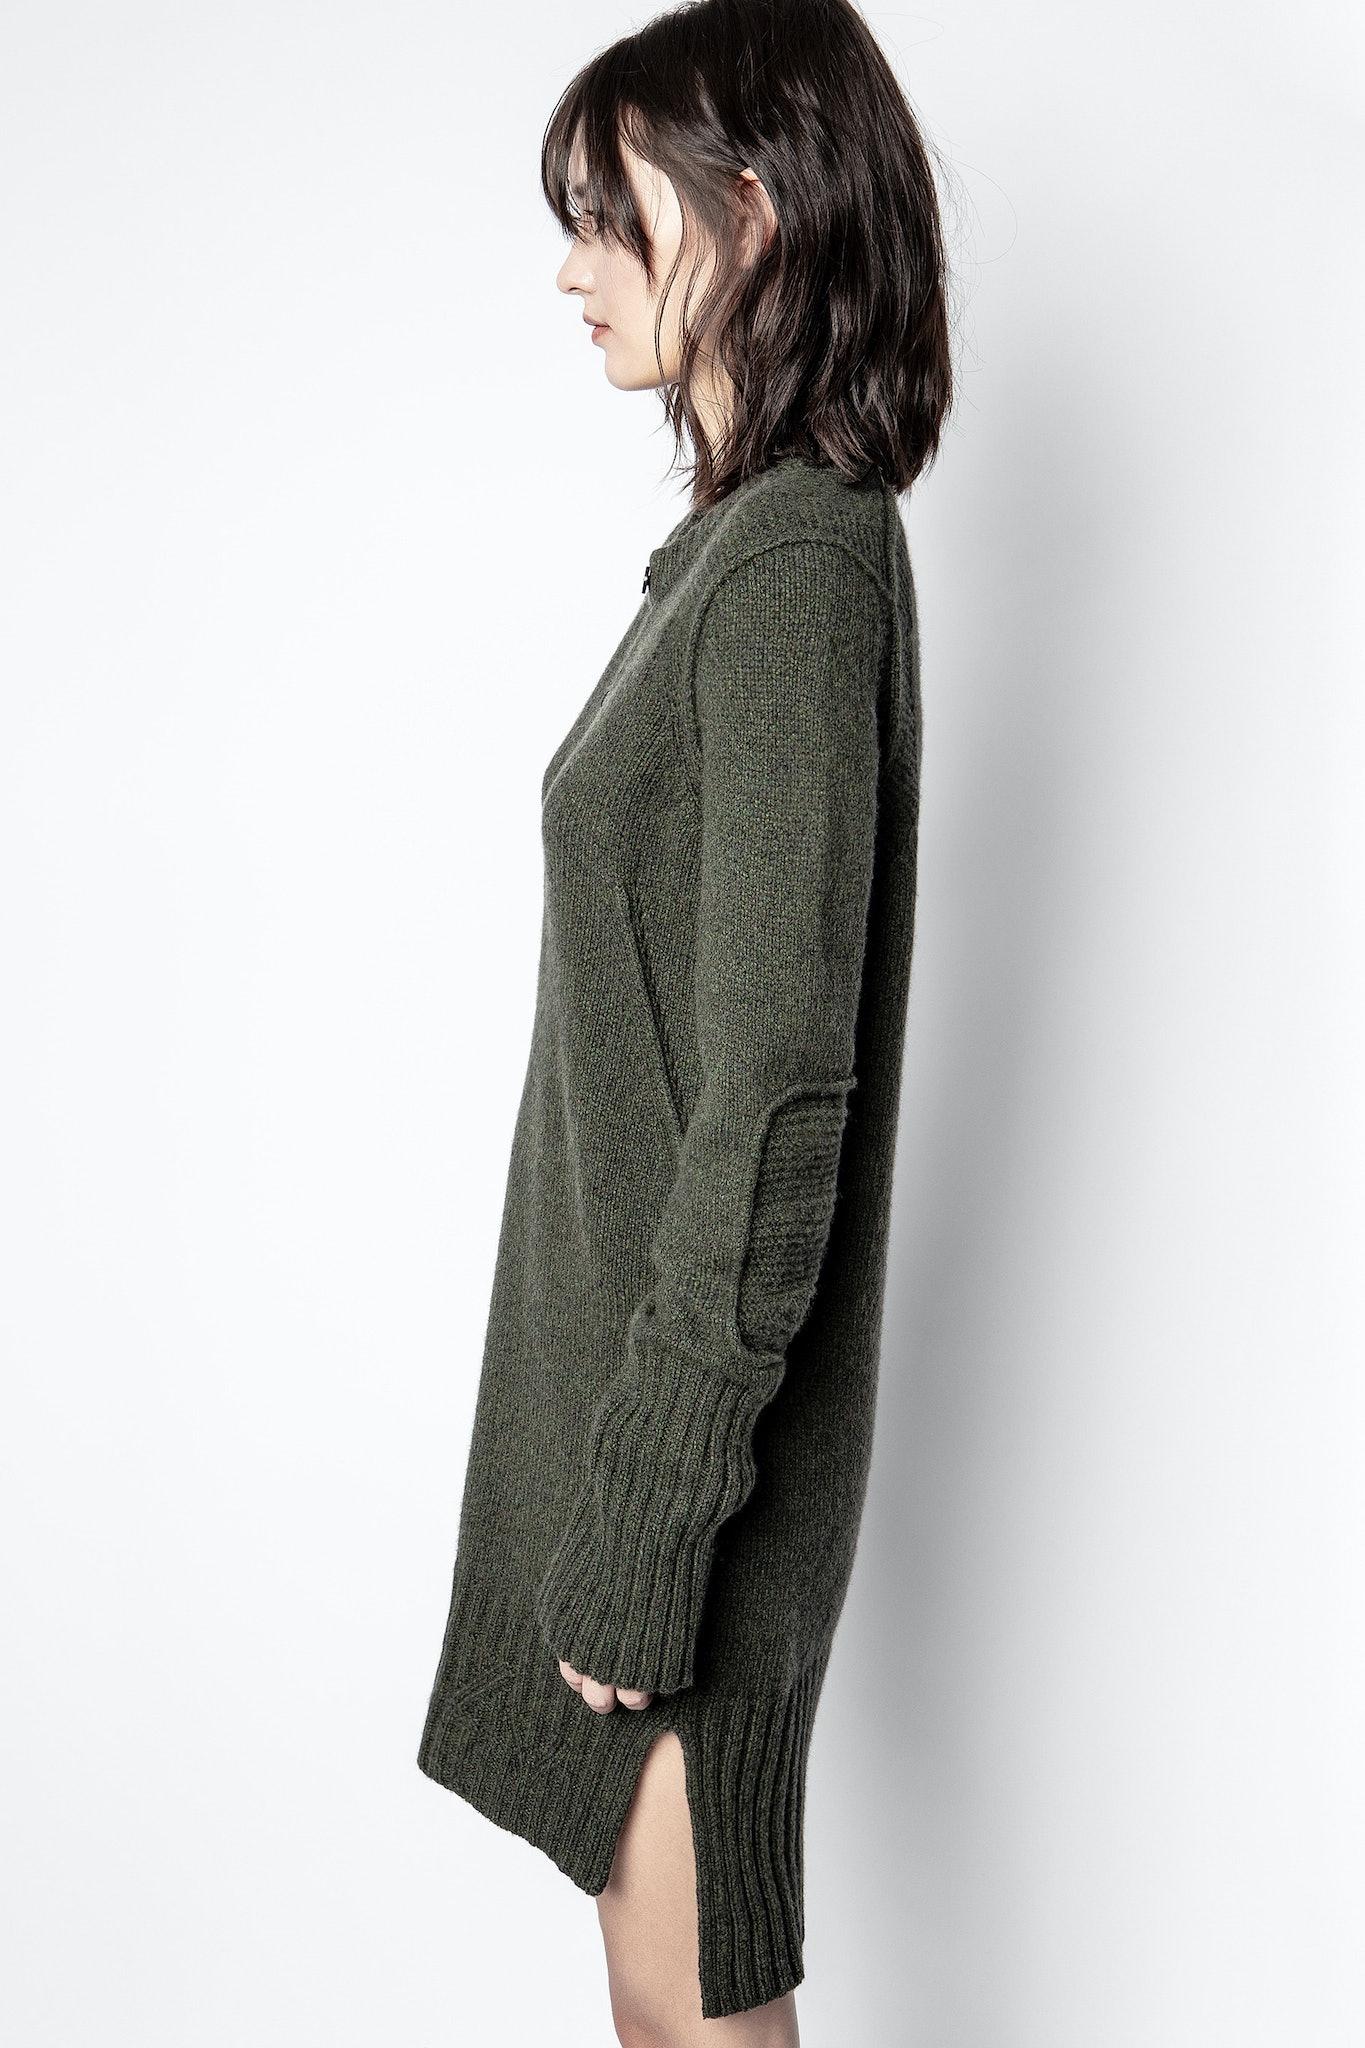 Iéna Cachemire Dress